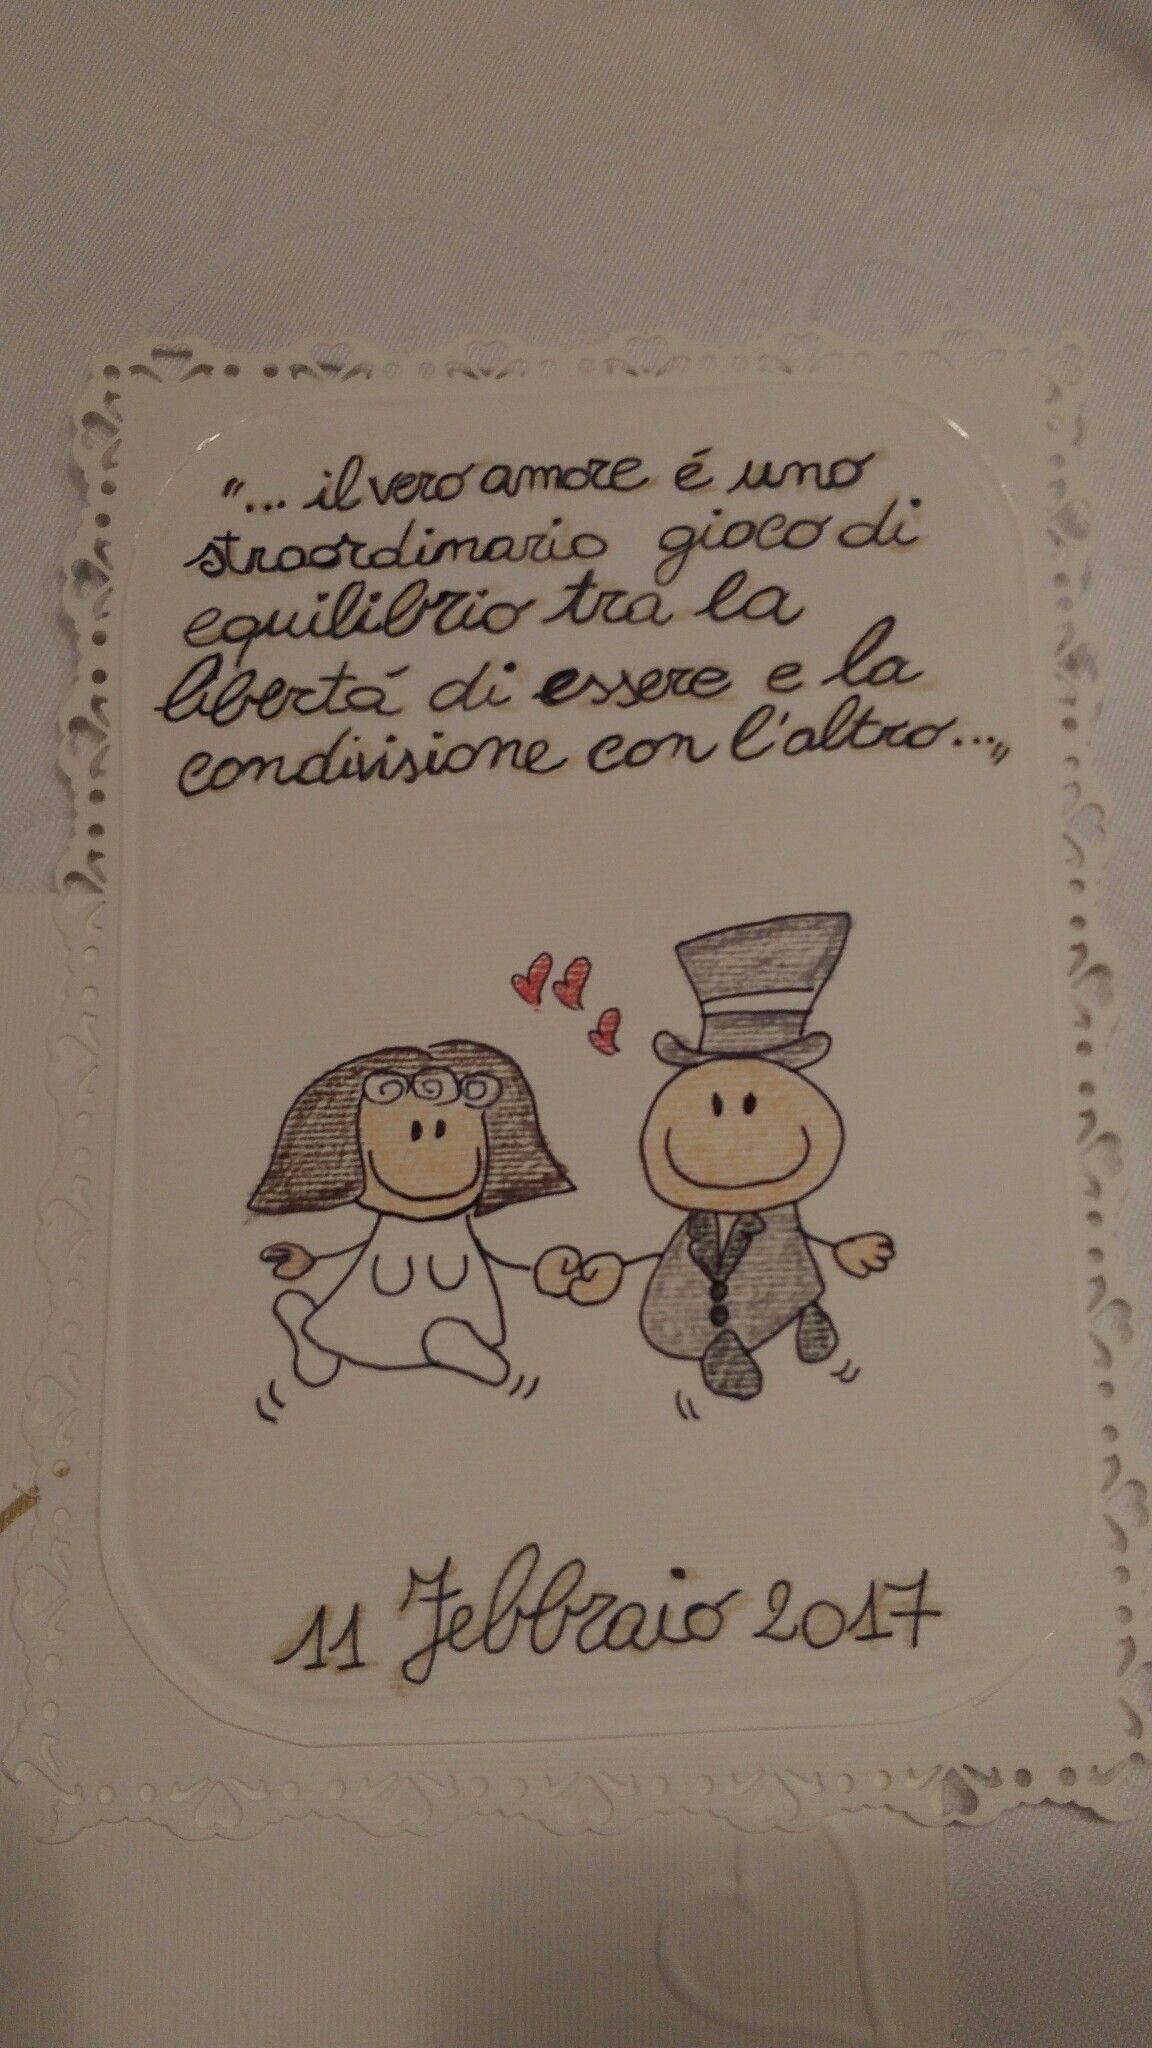 Frasi Per Un 50 Anniversario Di Matrimonio.6 Biglietto Anniversario 50 Anni Biglietto Di Matrimonio